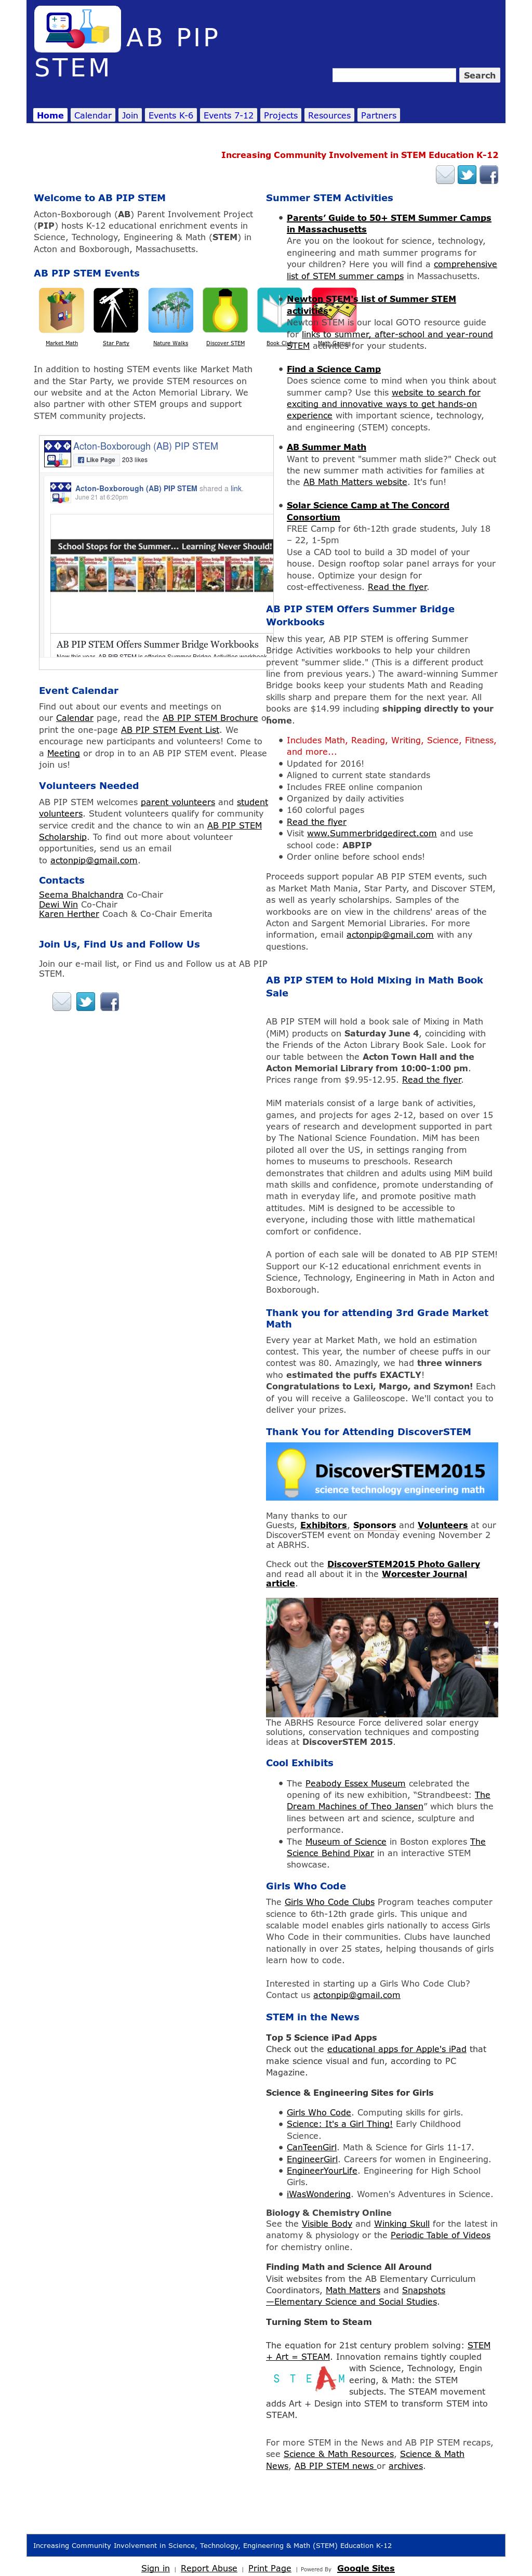 Acton-boxborough (Ab) Pip Stem Competitors, Revenue and Employees ...